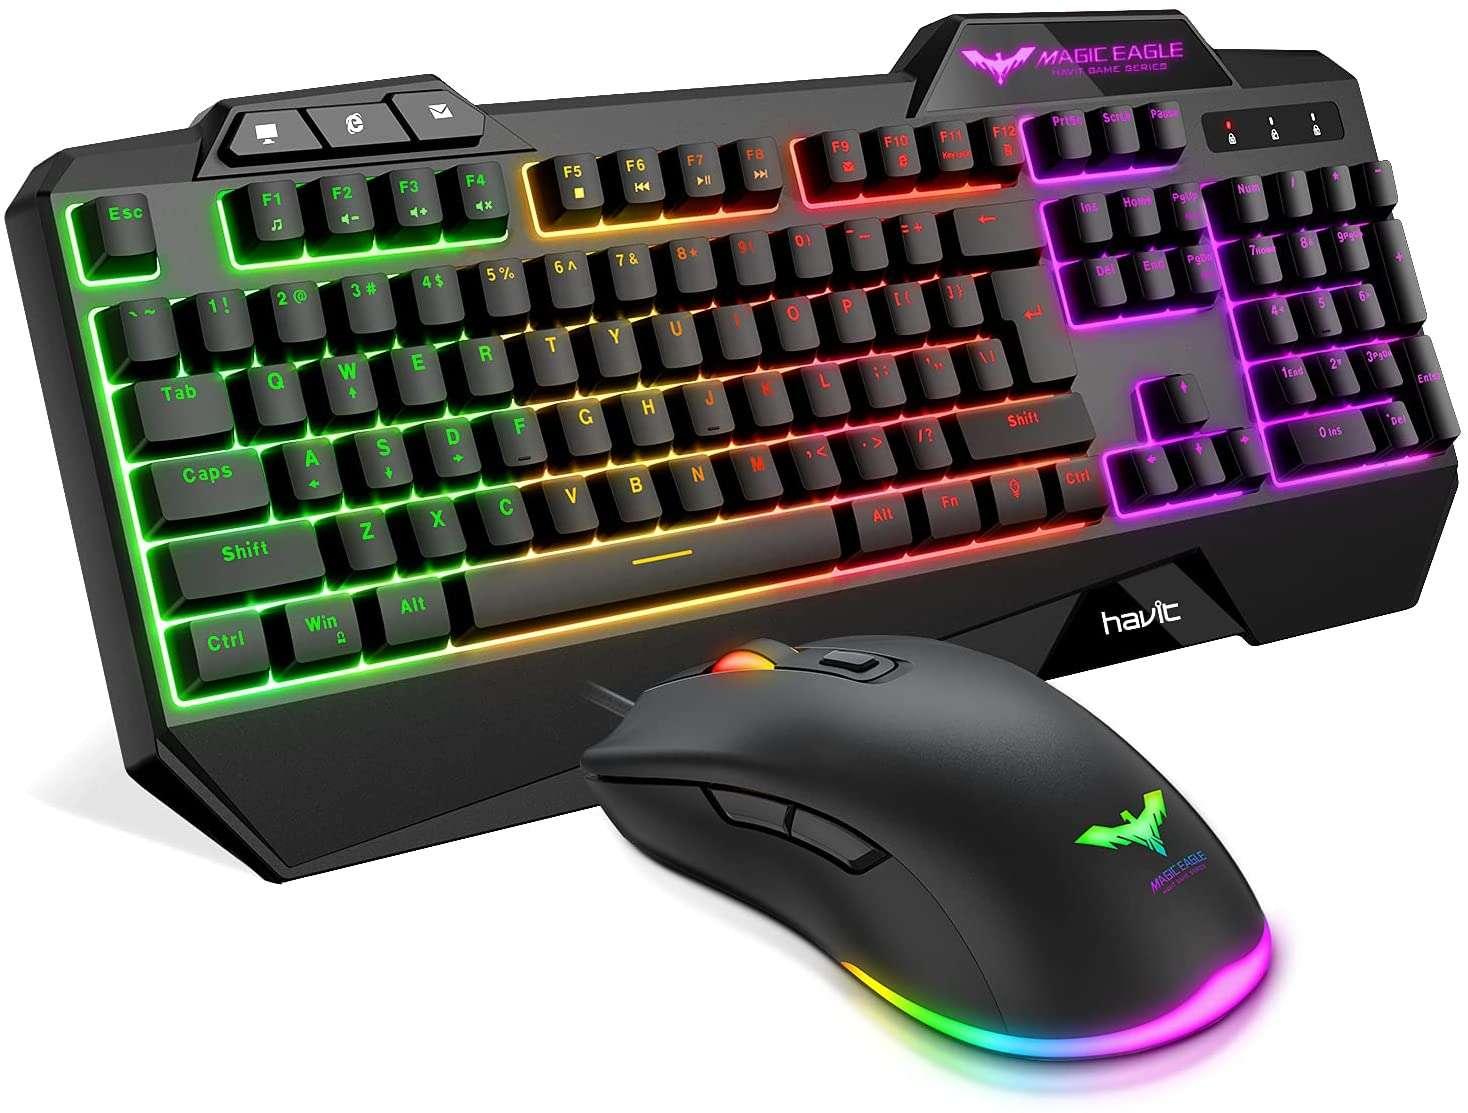 havit rgb backlit gaming keyboard mouse combo